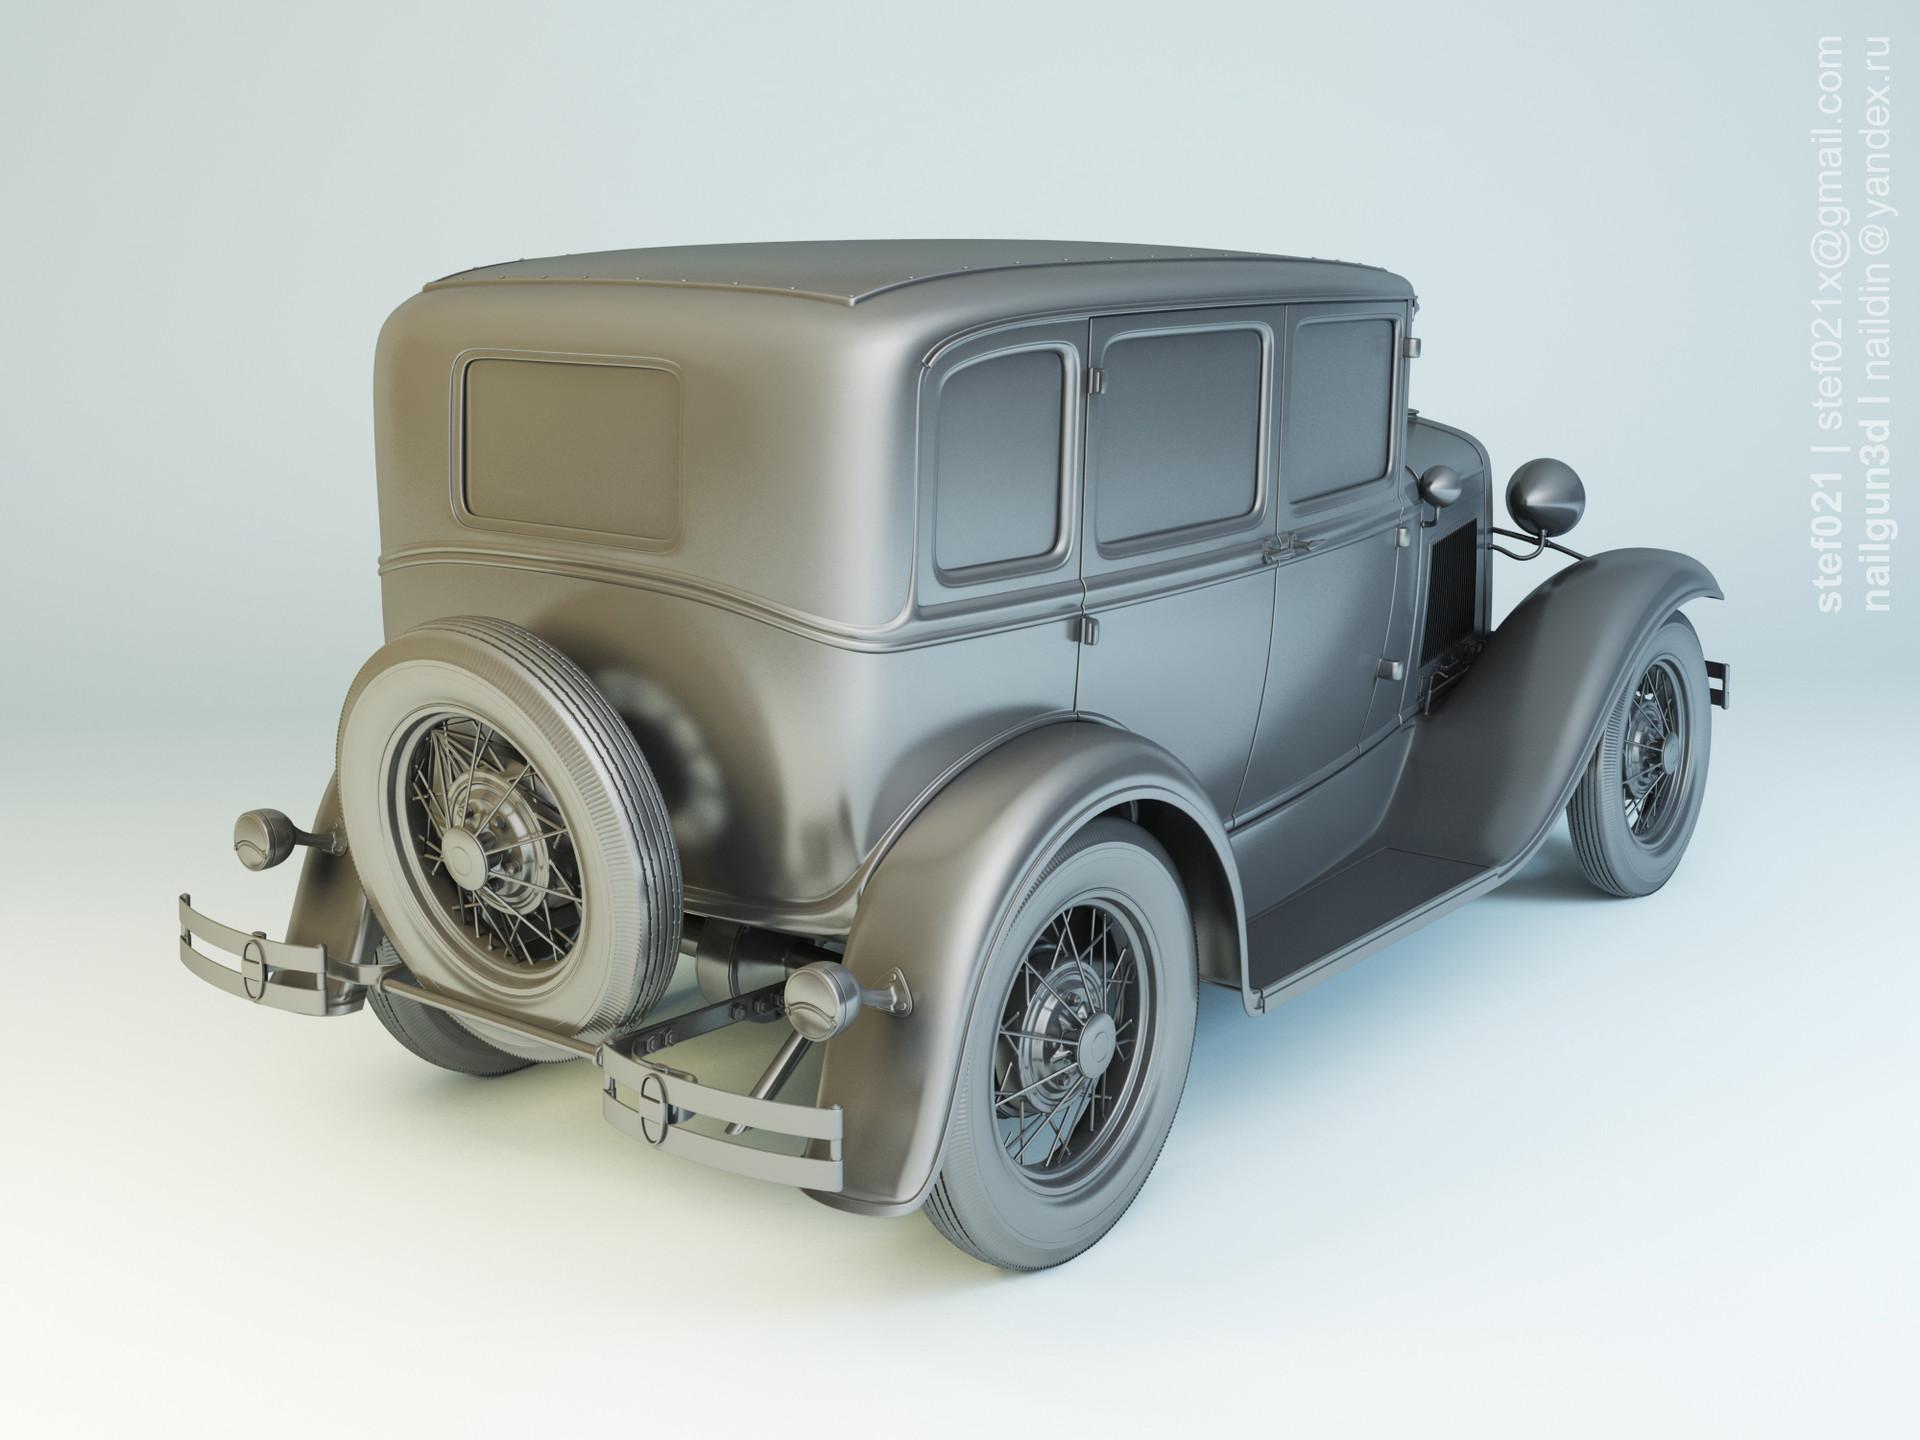 Nail khusnutdinov a0003 ford a fordor 1931 clay 1